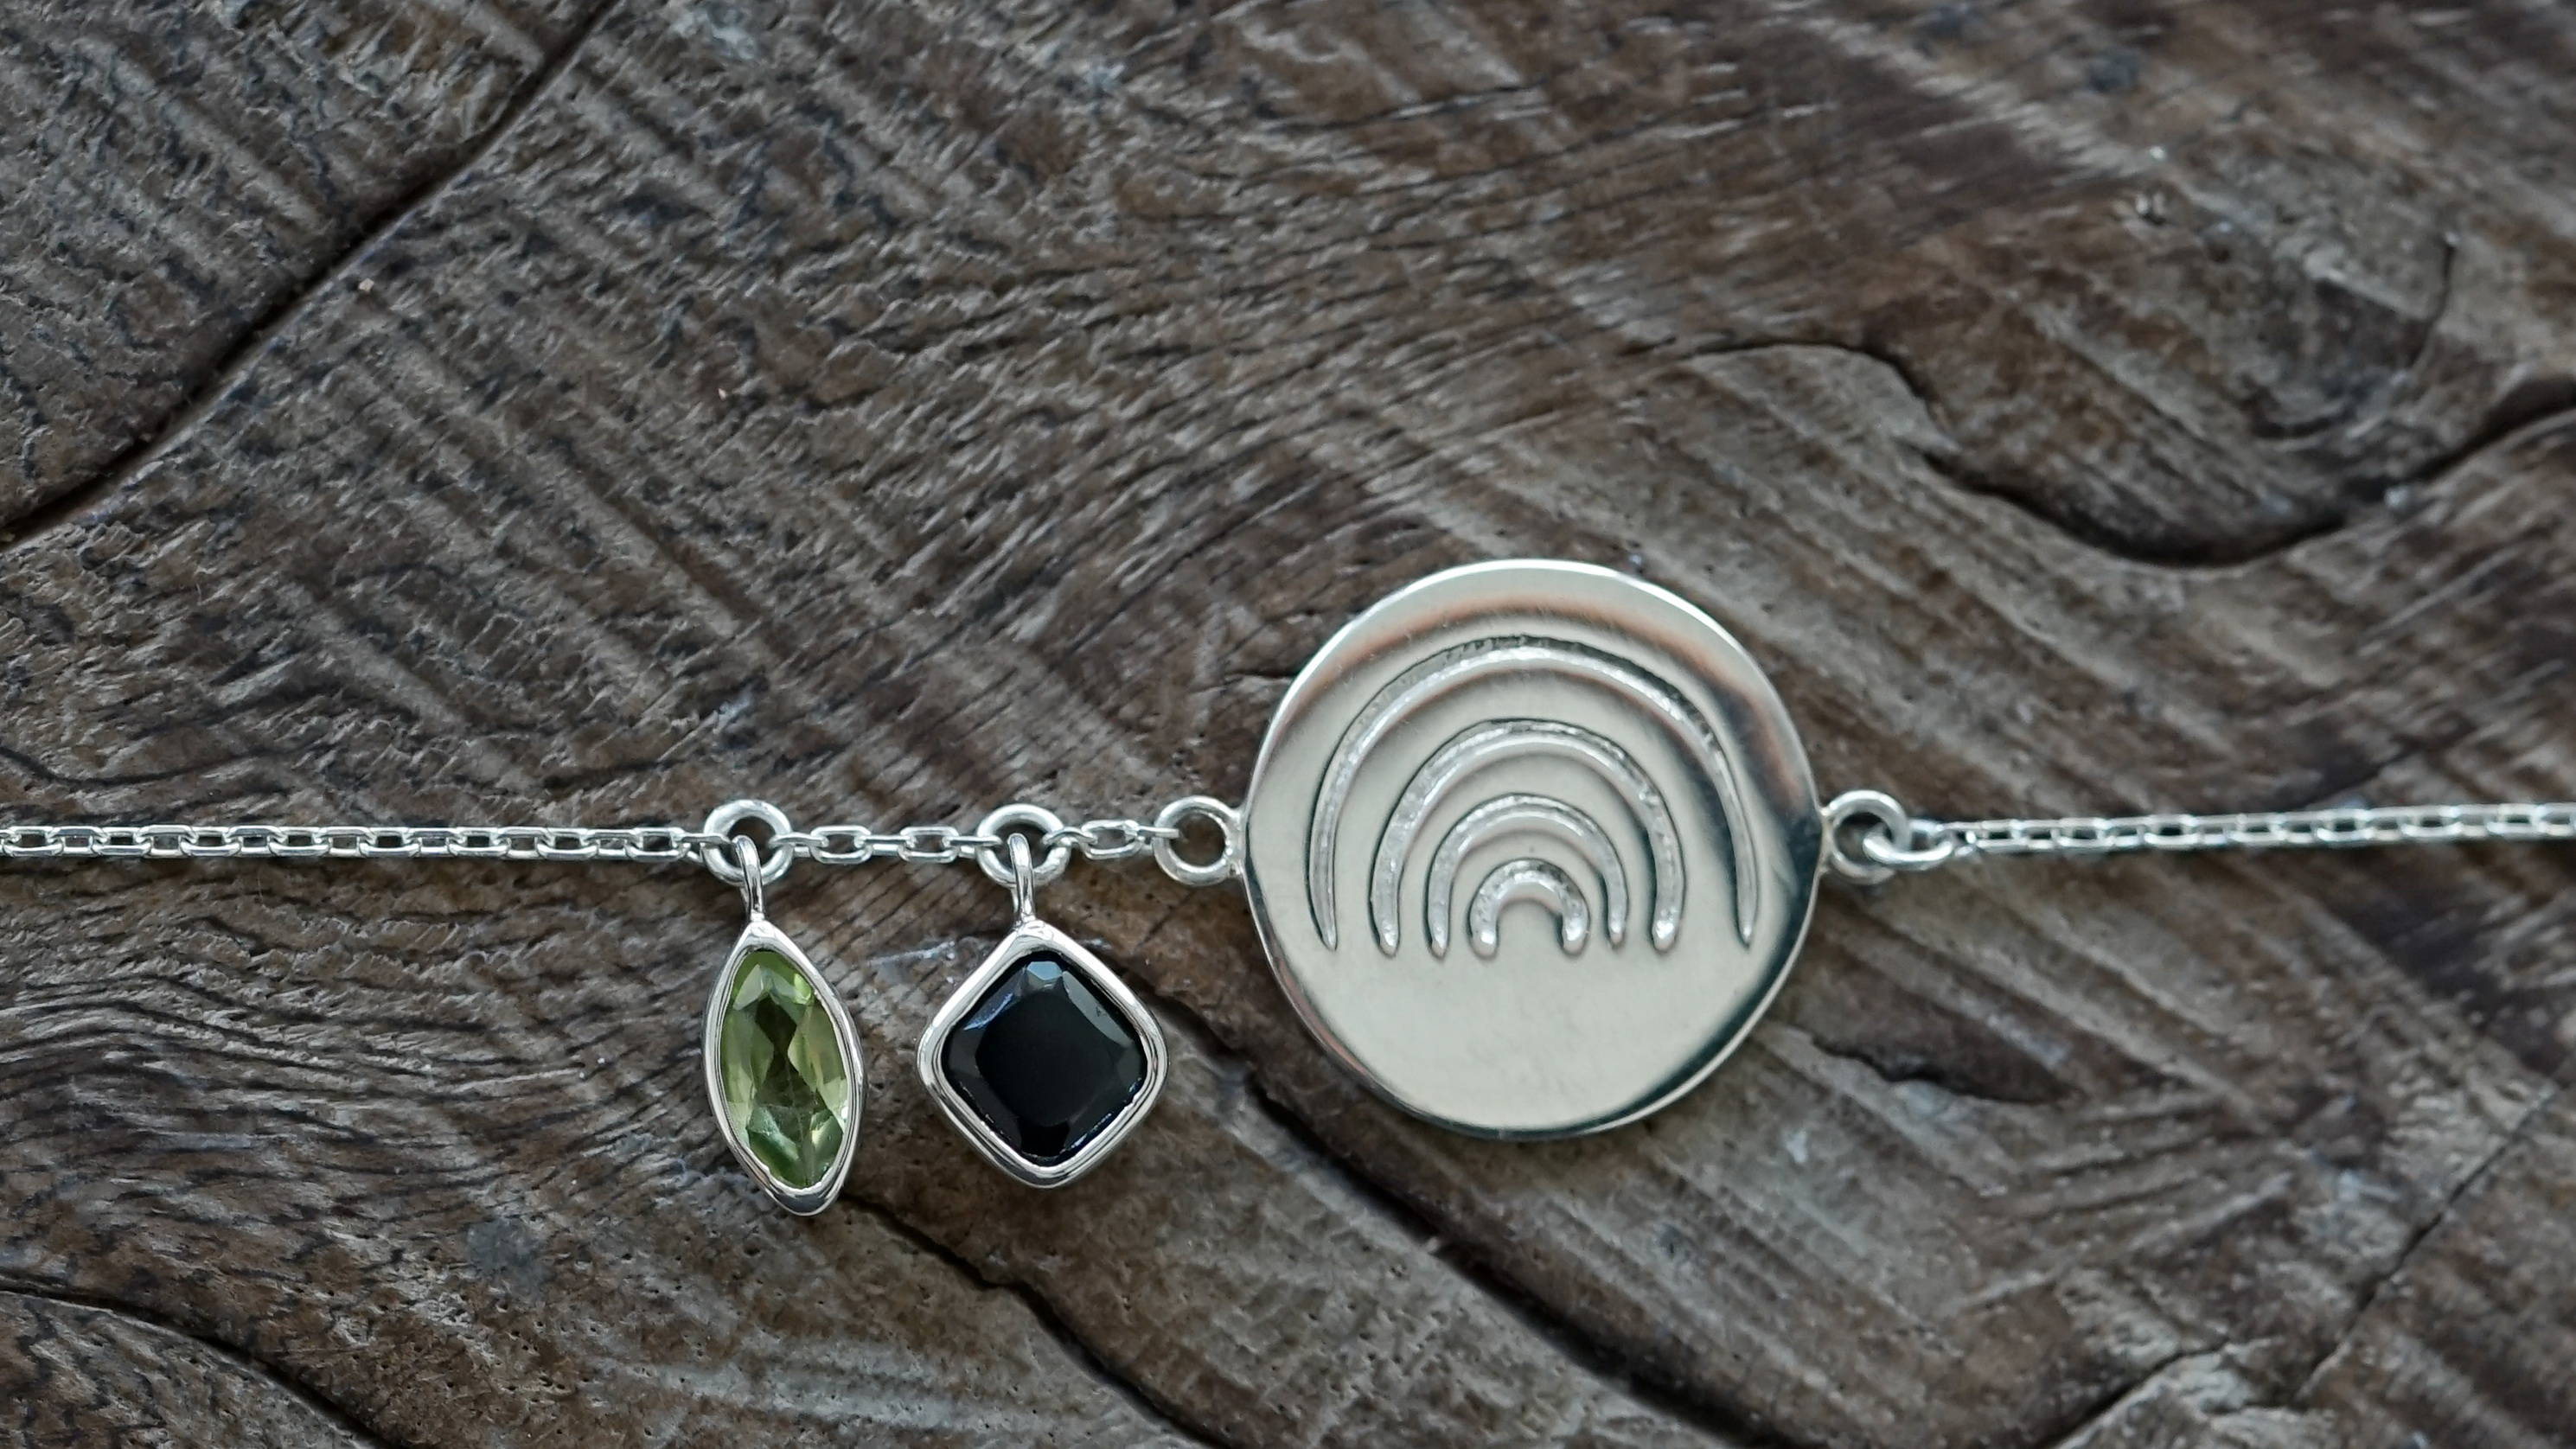 Customized silver bracelet with gemstones